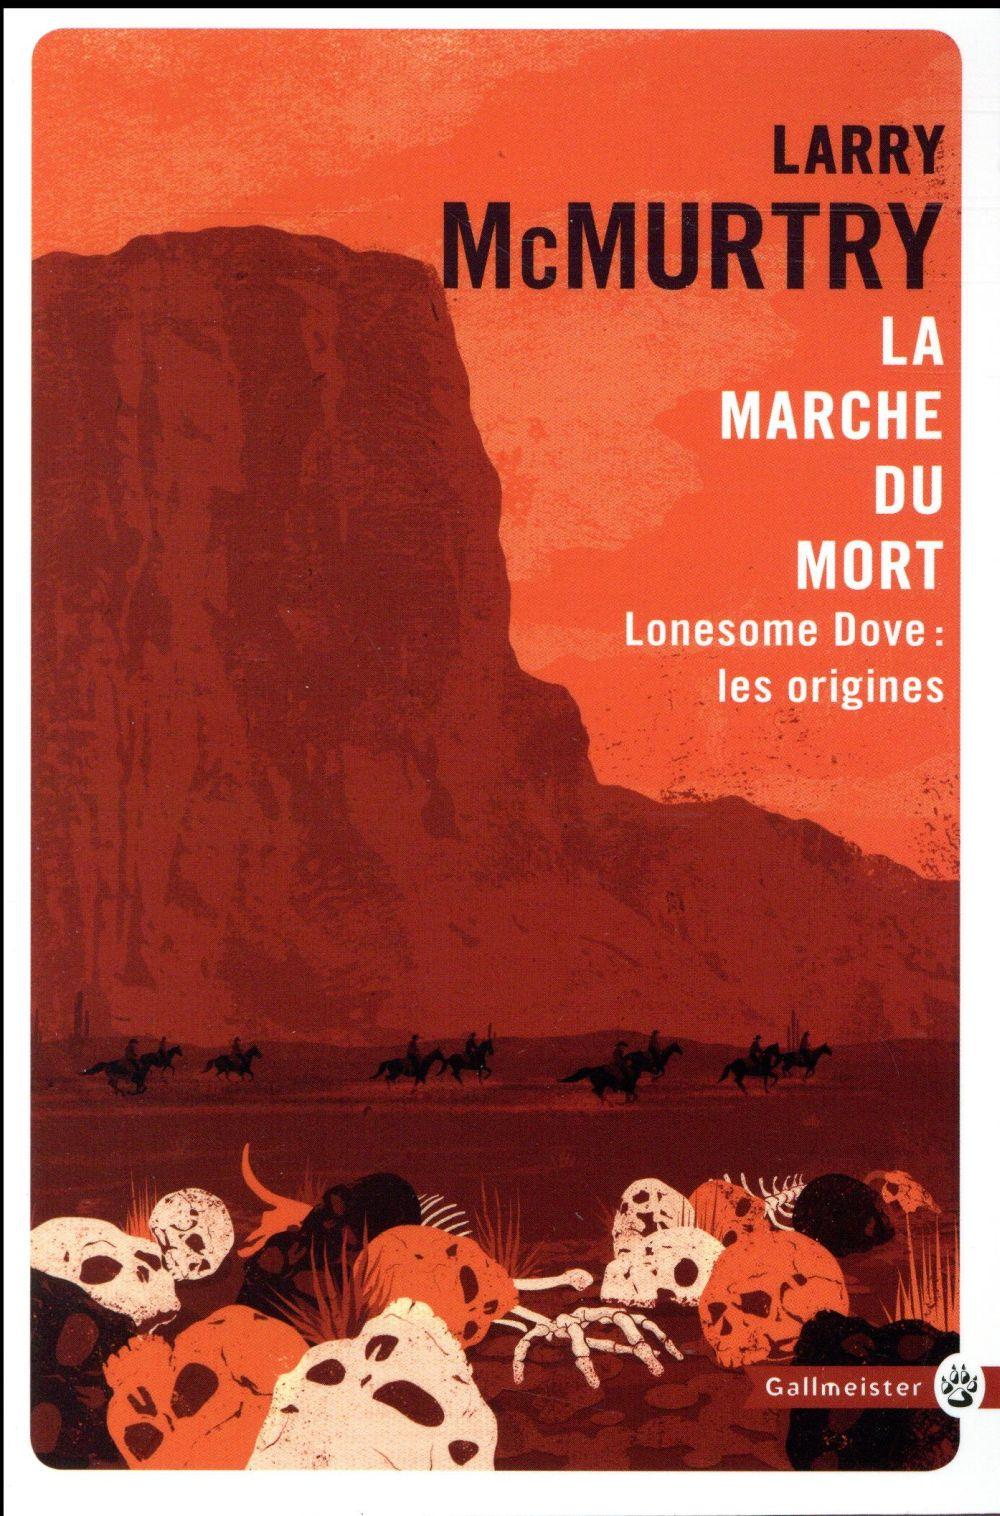 LA MARCHE DU MORT - LONESOME D MCMURTRY LARRY GALLMEISTER